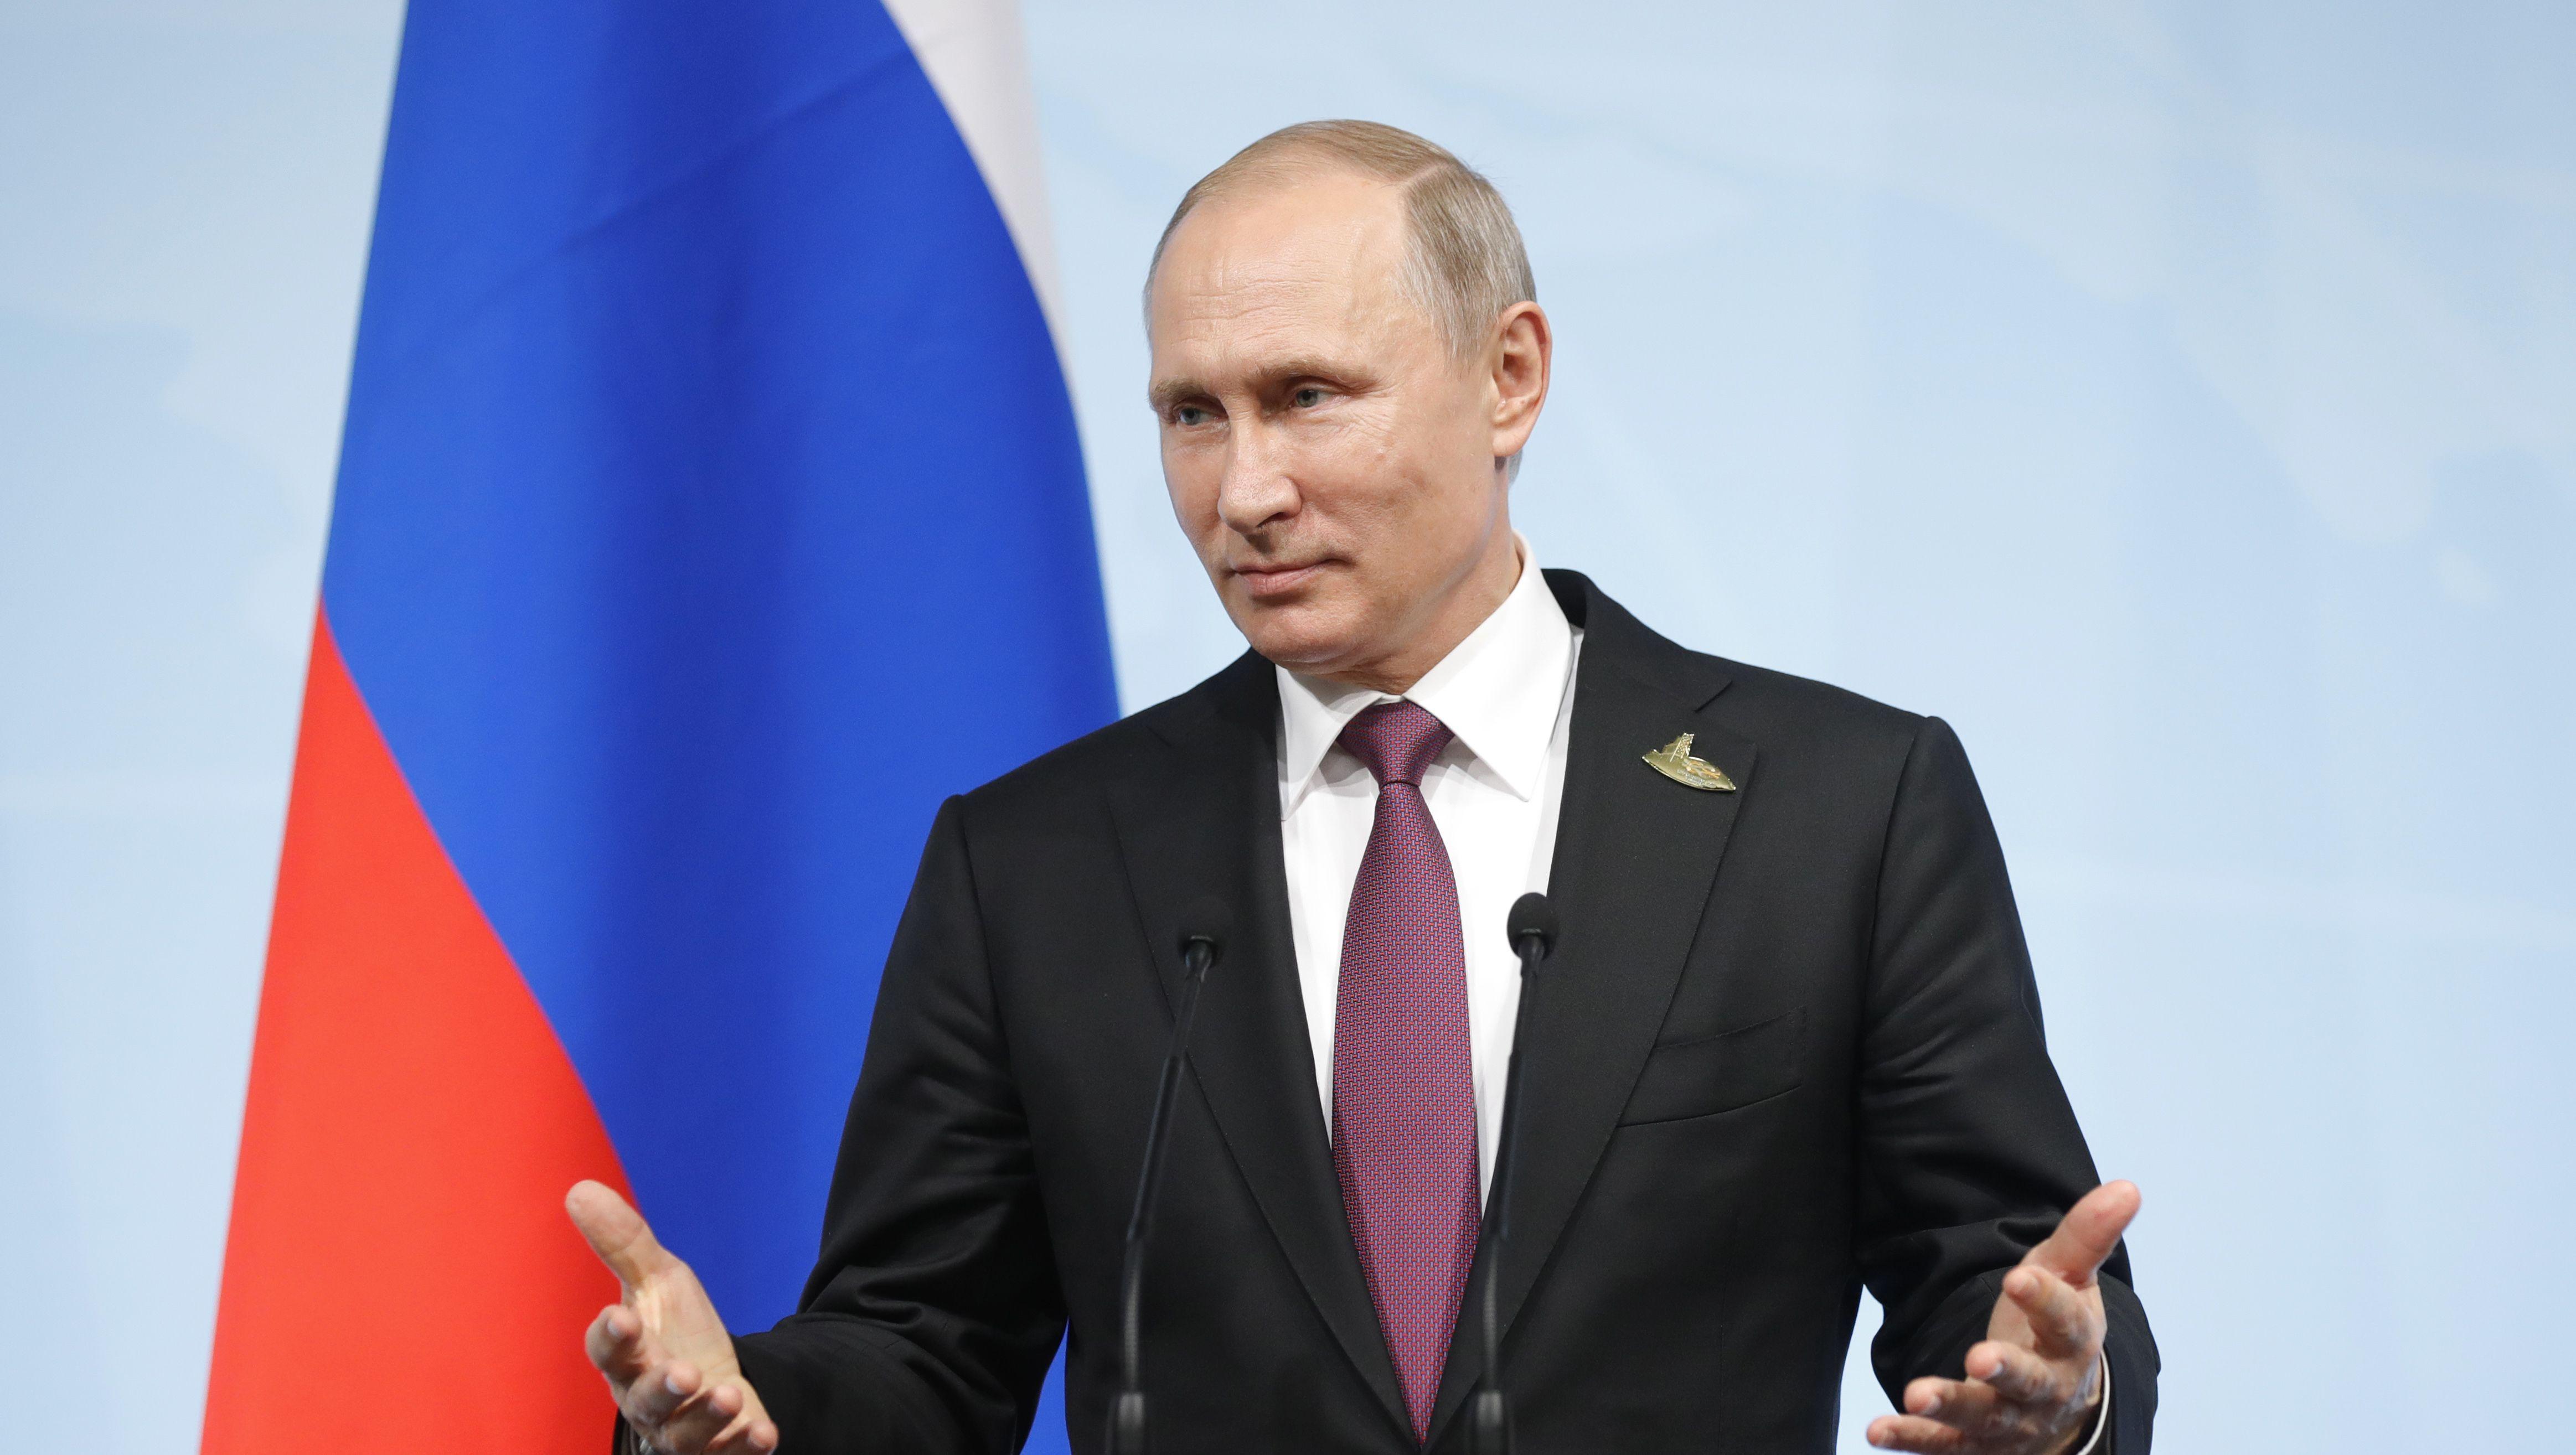 Putin says Americans don't show Trump enough respect